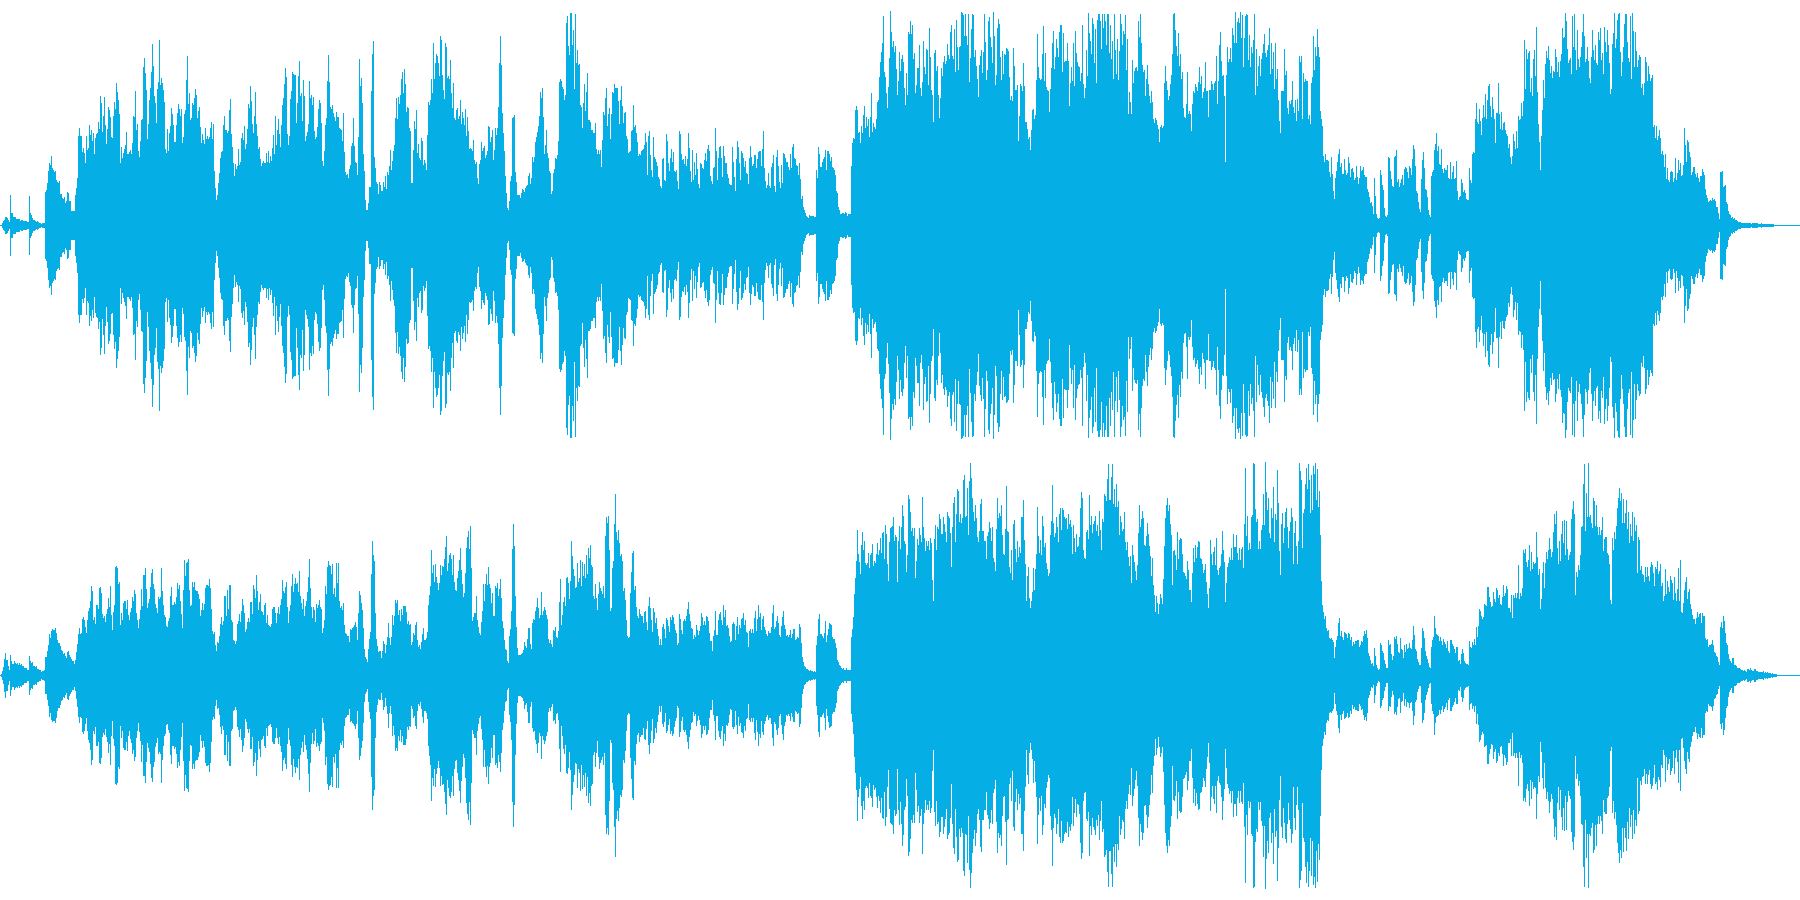 RPG 回想/優しさ/エピローグの再生済みの波形